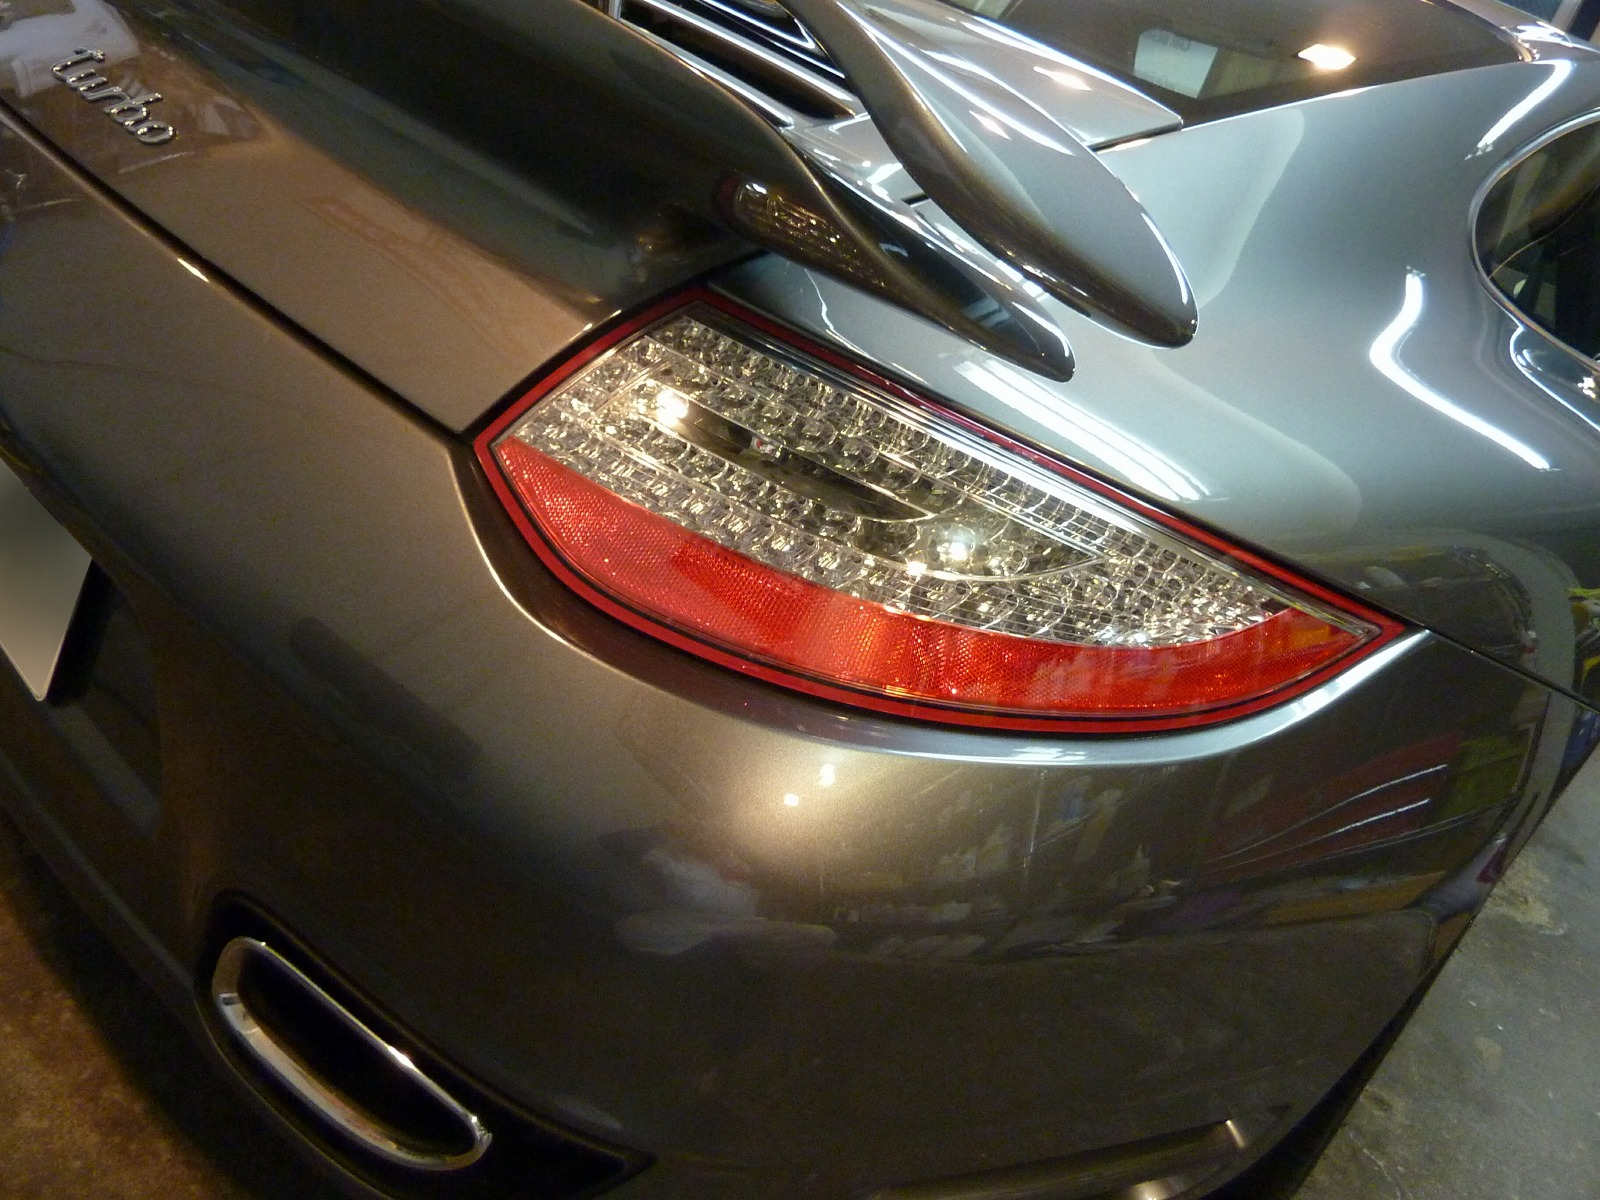 20140212-porsche-911-turbo-11